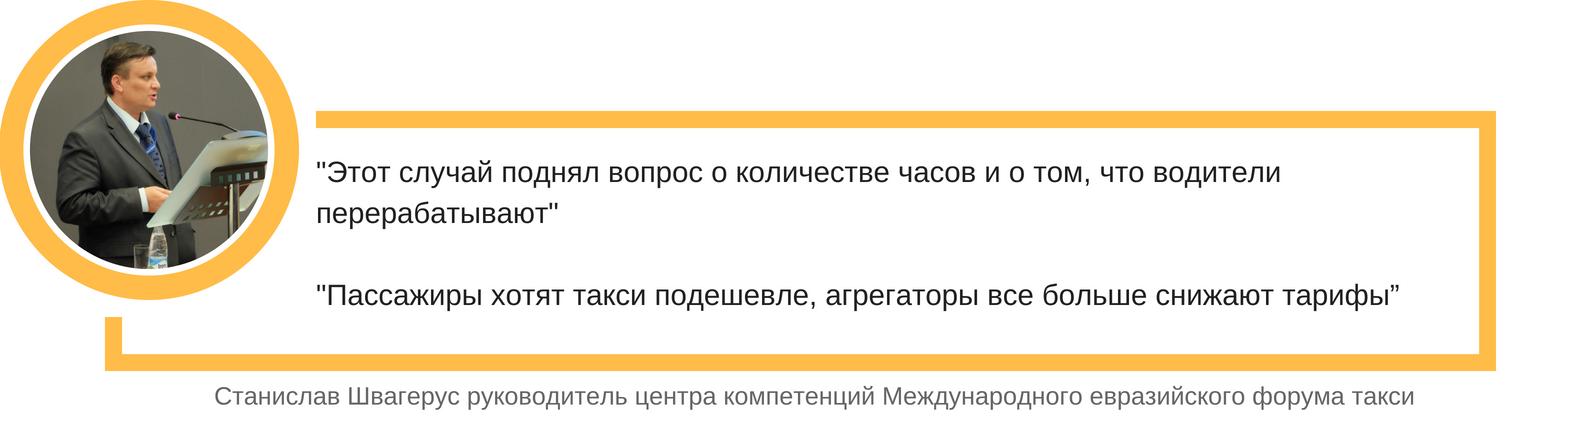 Швагерус о таксистах